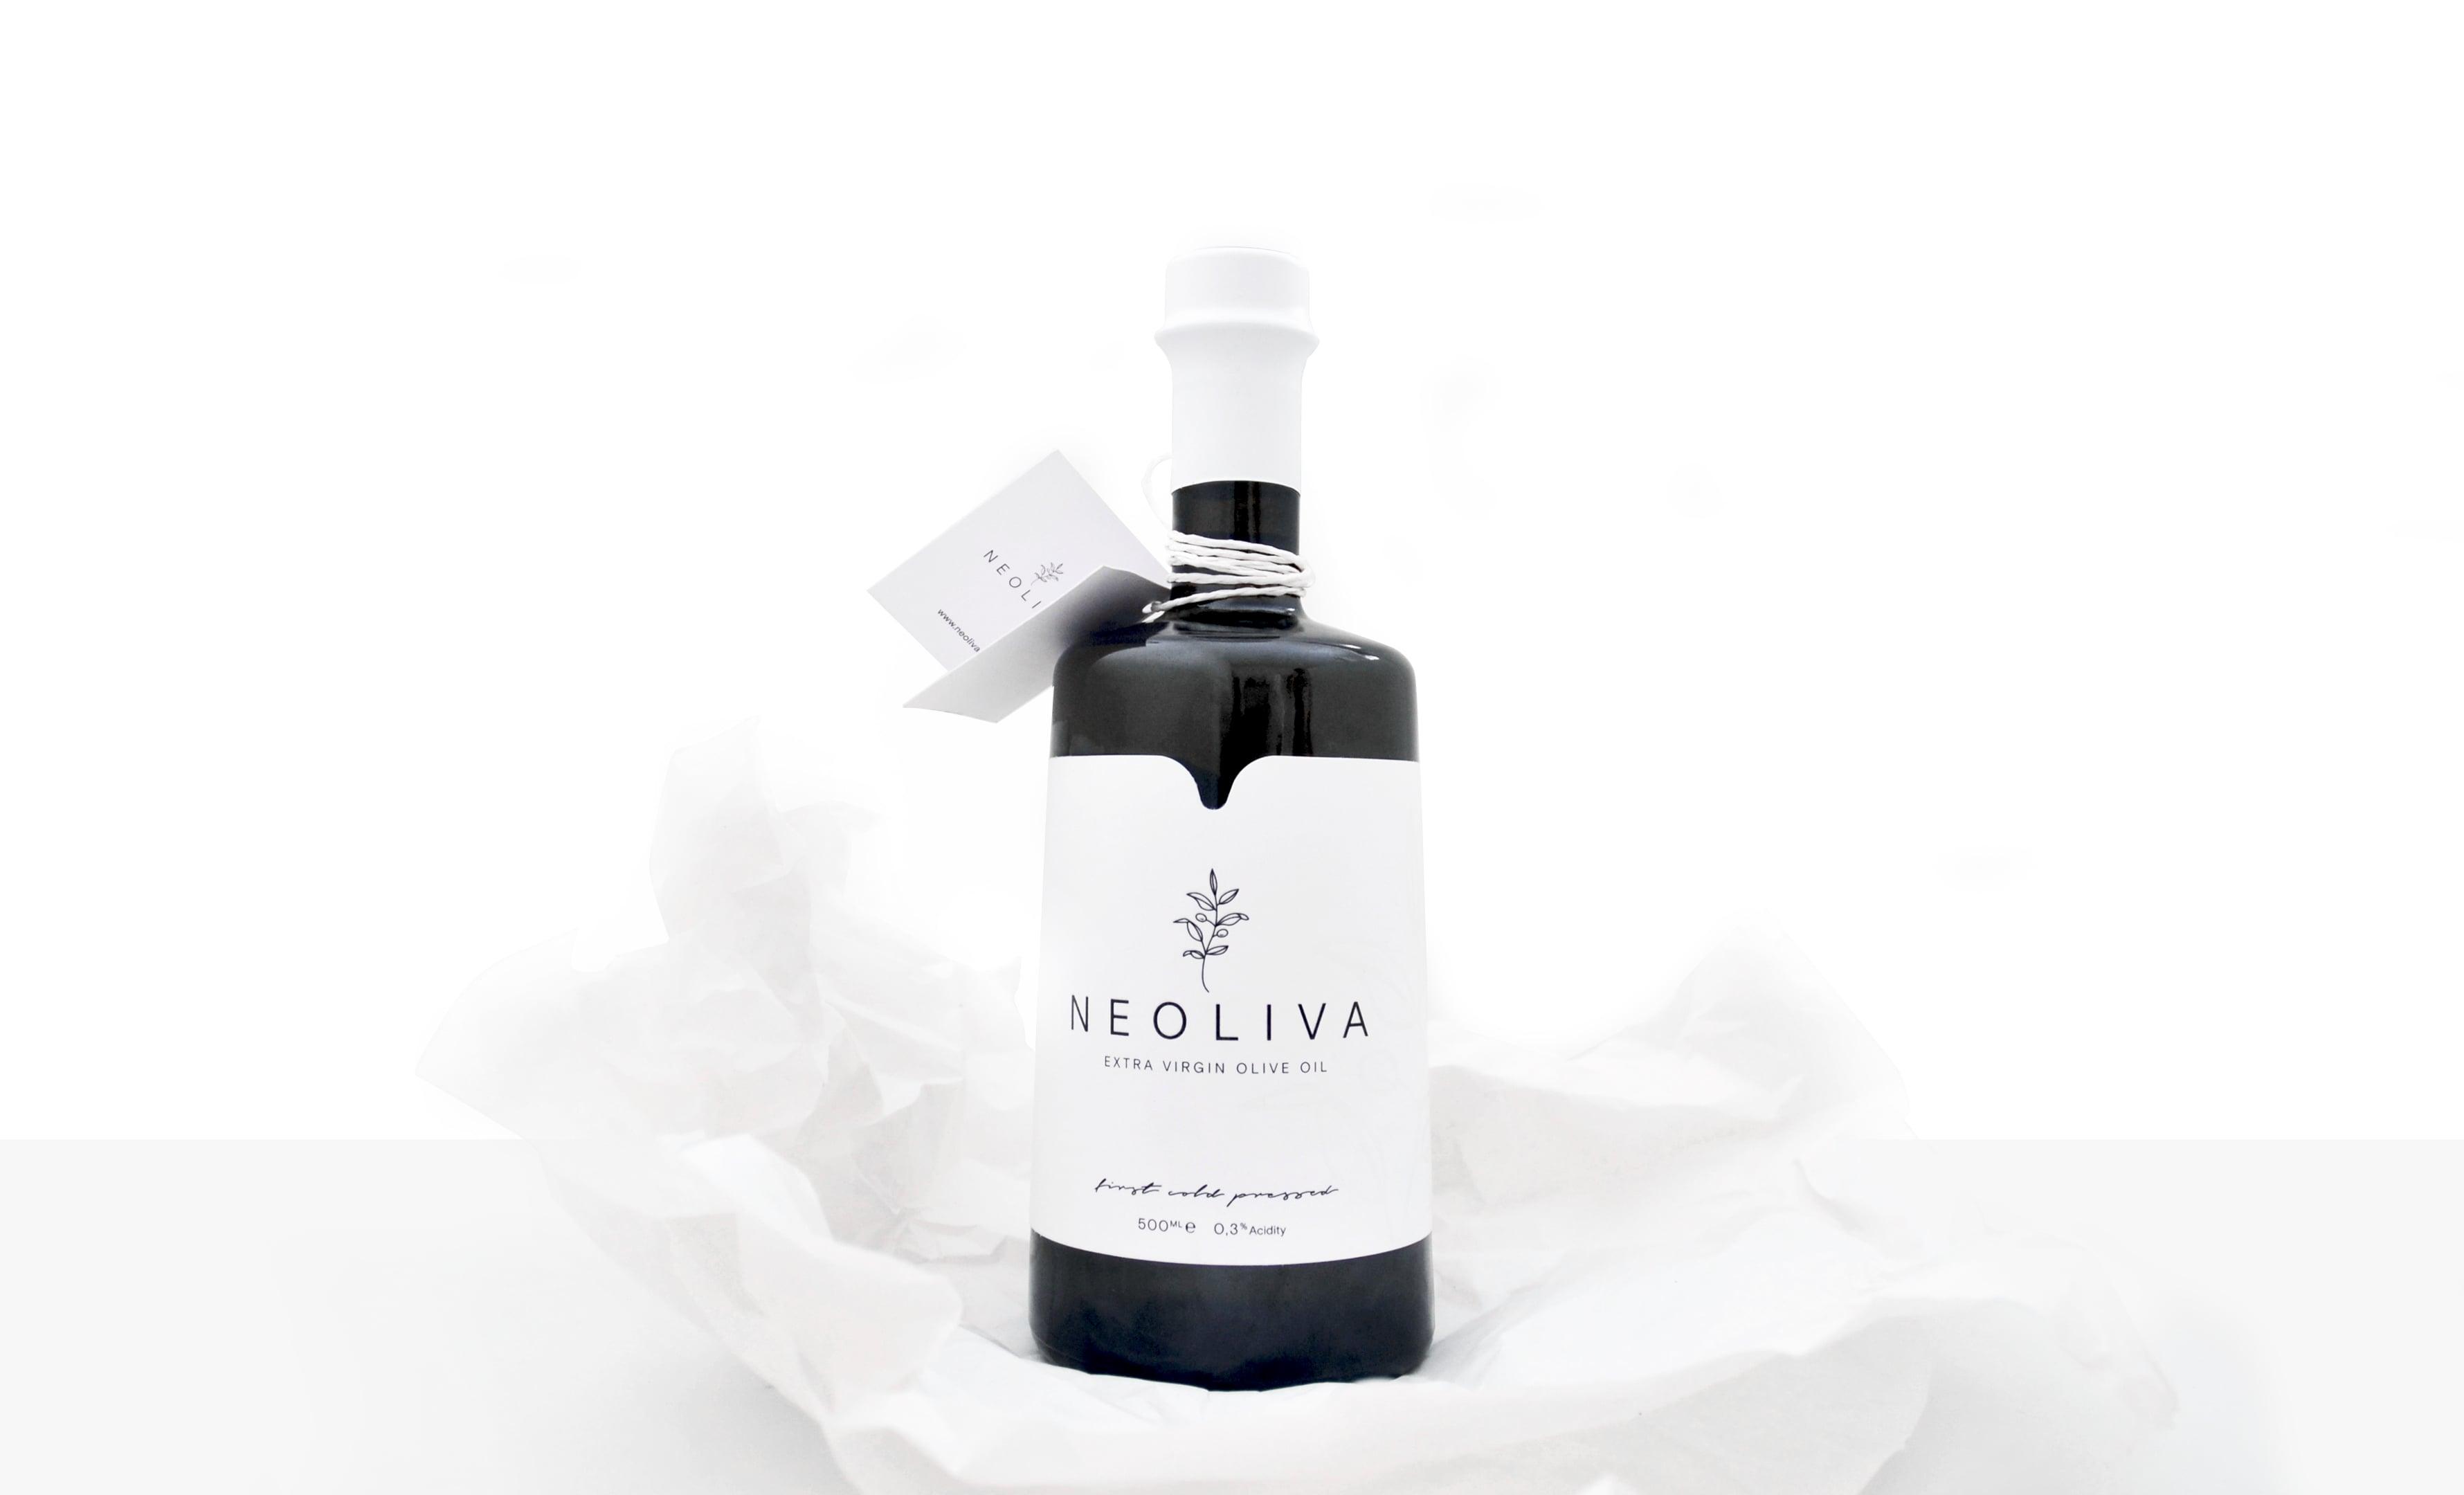 Neoliva-Gokten-Tut-Website-8-1